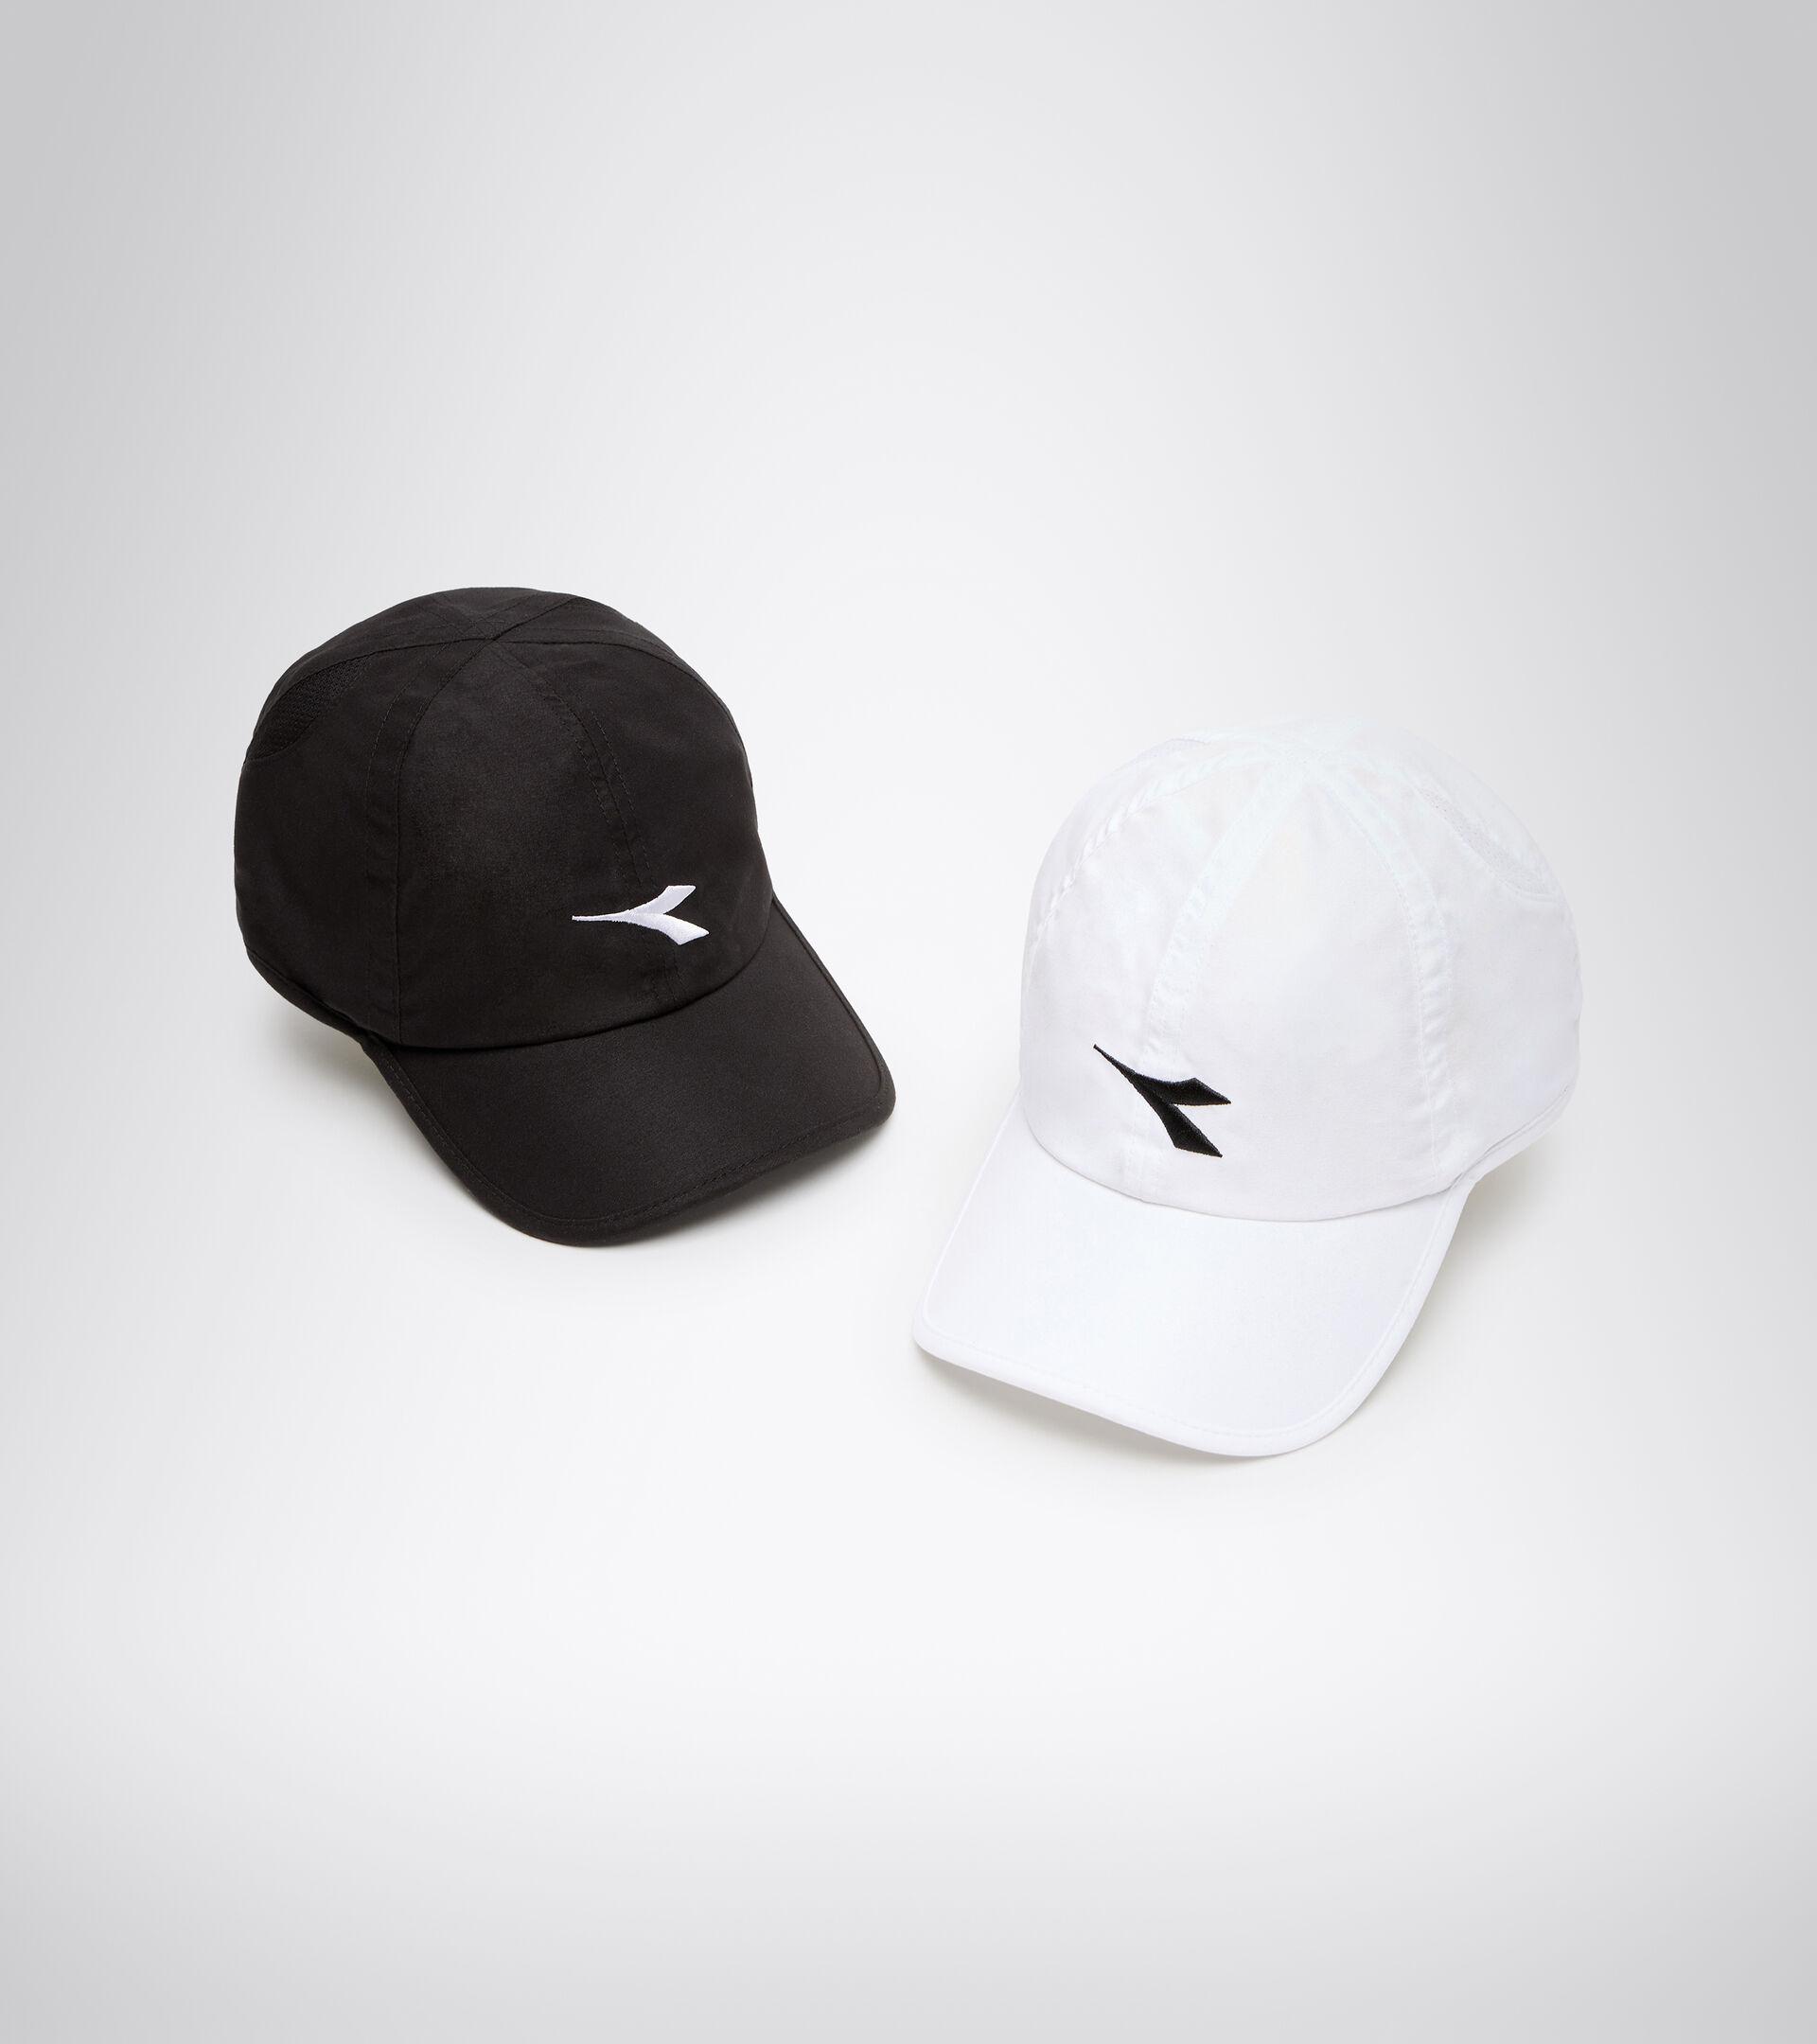 Tennis-style hat - Unisex ADJUSTABLE CAP WHITE/BLACK - Diadora